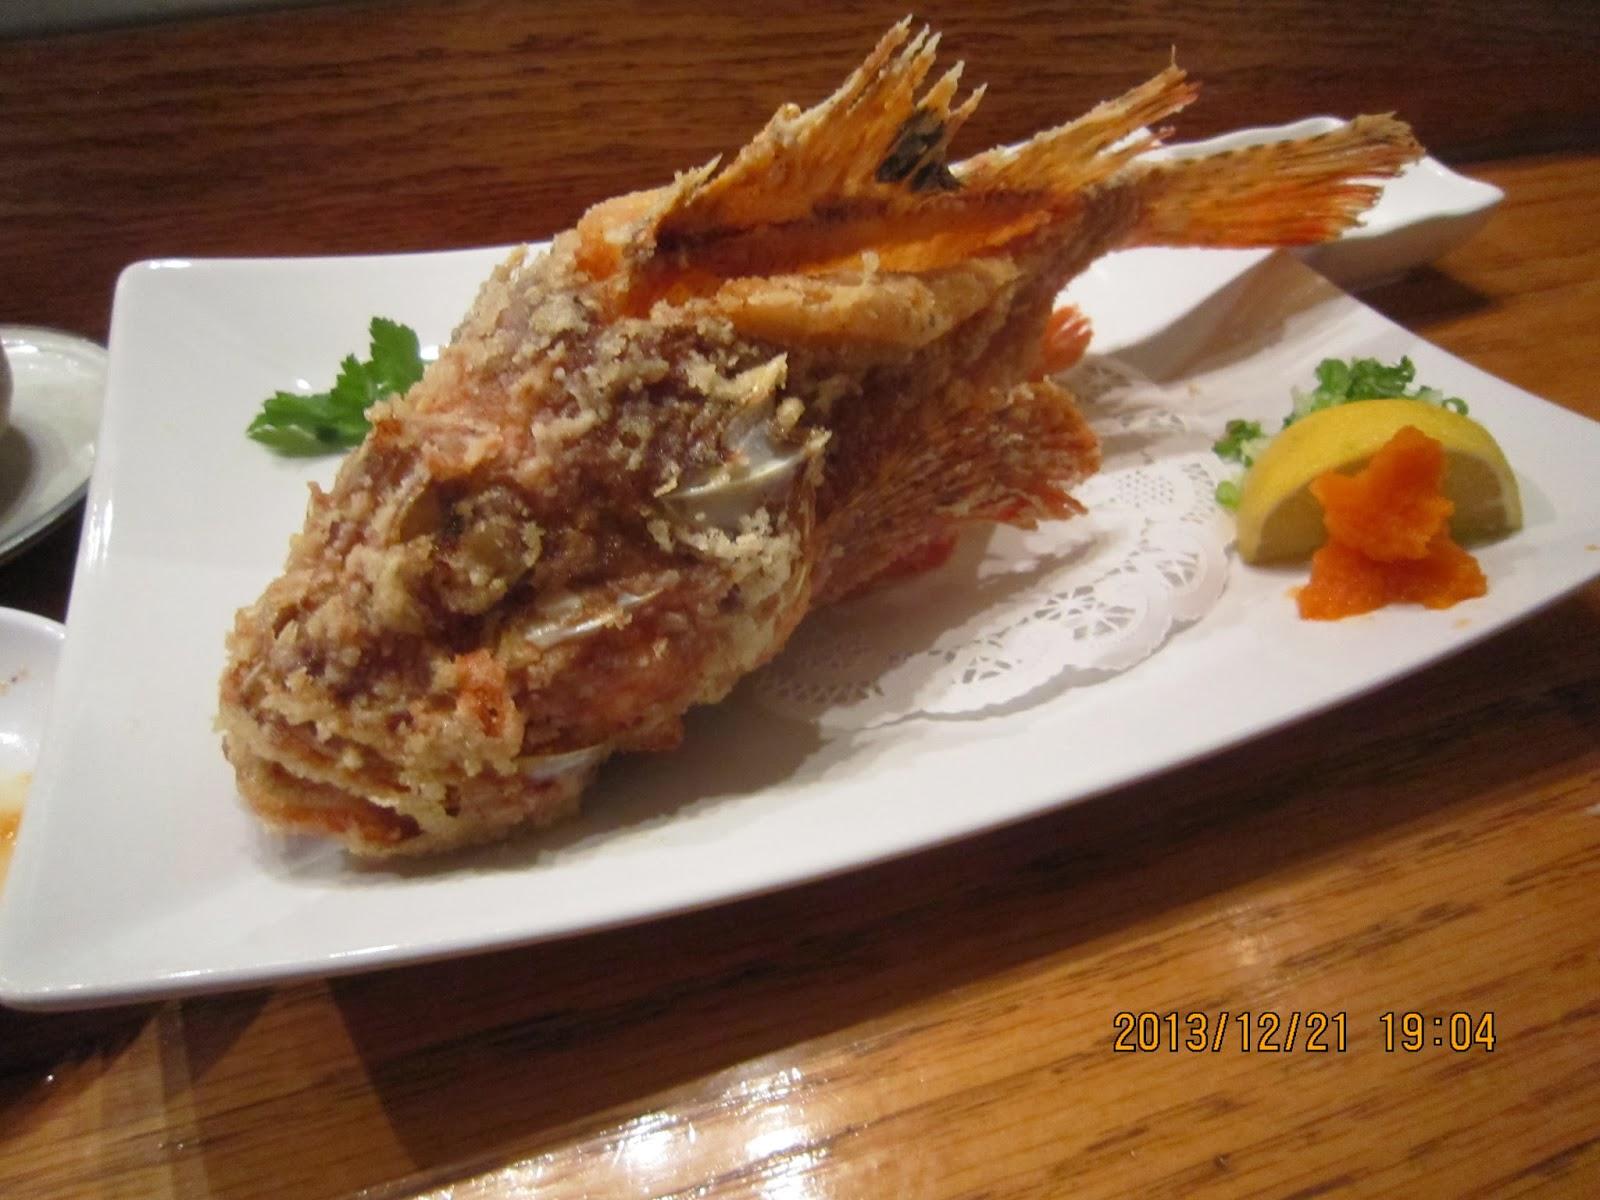 Rambling and gambling takesushi sunnyside the best for Fish as food